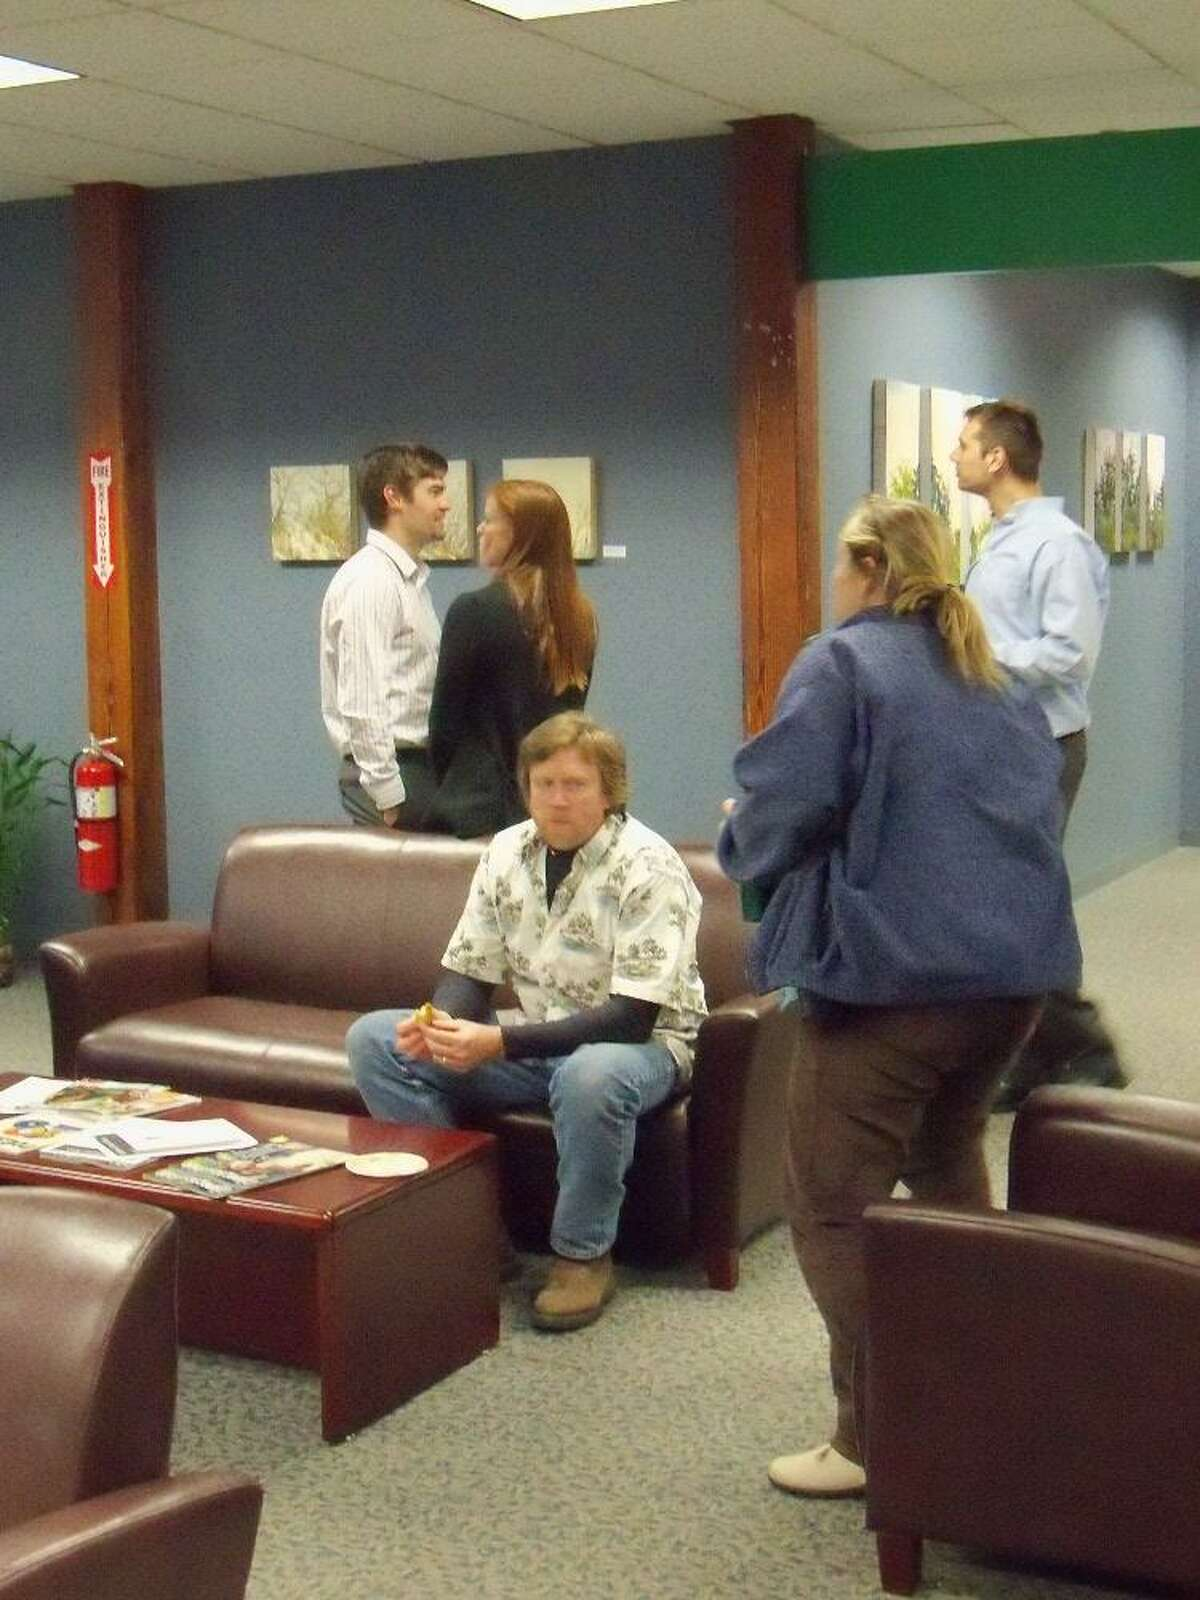 The Register Citizen Newsroom Cafe at 59 Field Street in Torrington features an